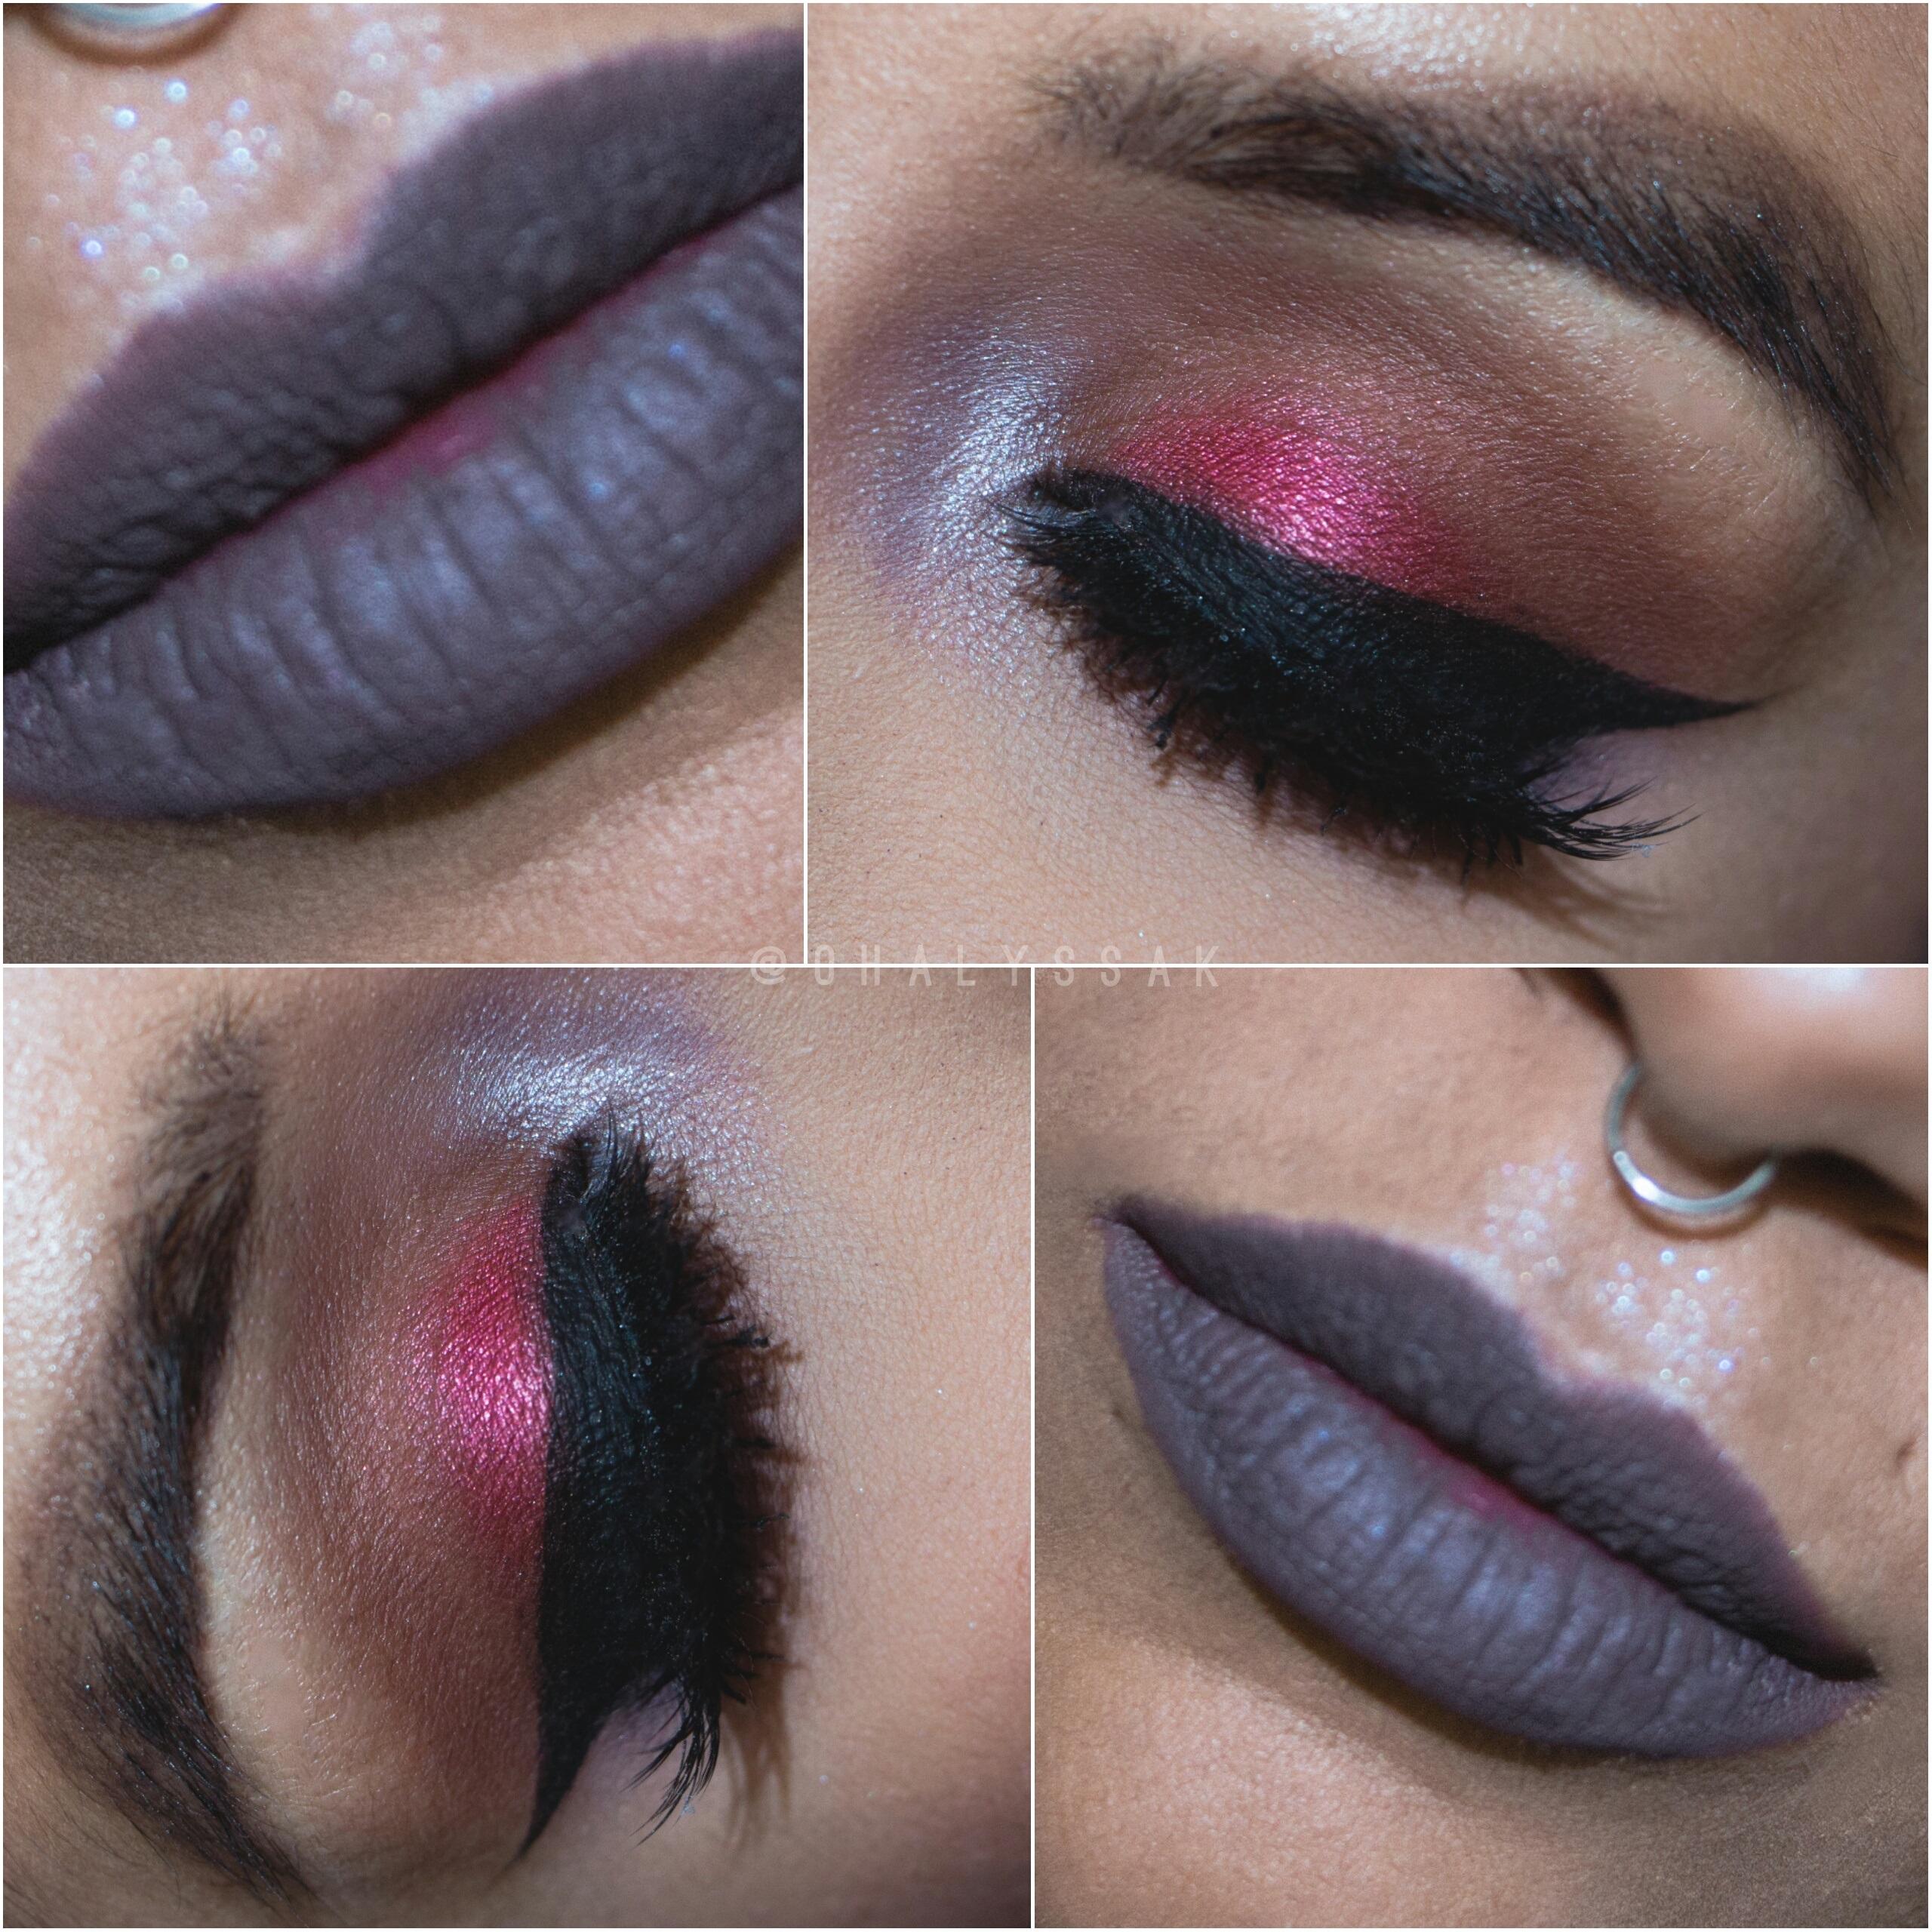 3bd4f24c607 Makeup Geek Plush Matte Lip MOTD Phoenix MUA ColourPop Glitter Injections  Wakeup and Makeup Morphe Brushes ...